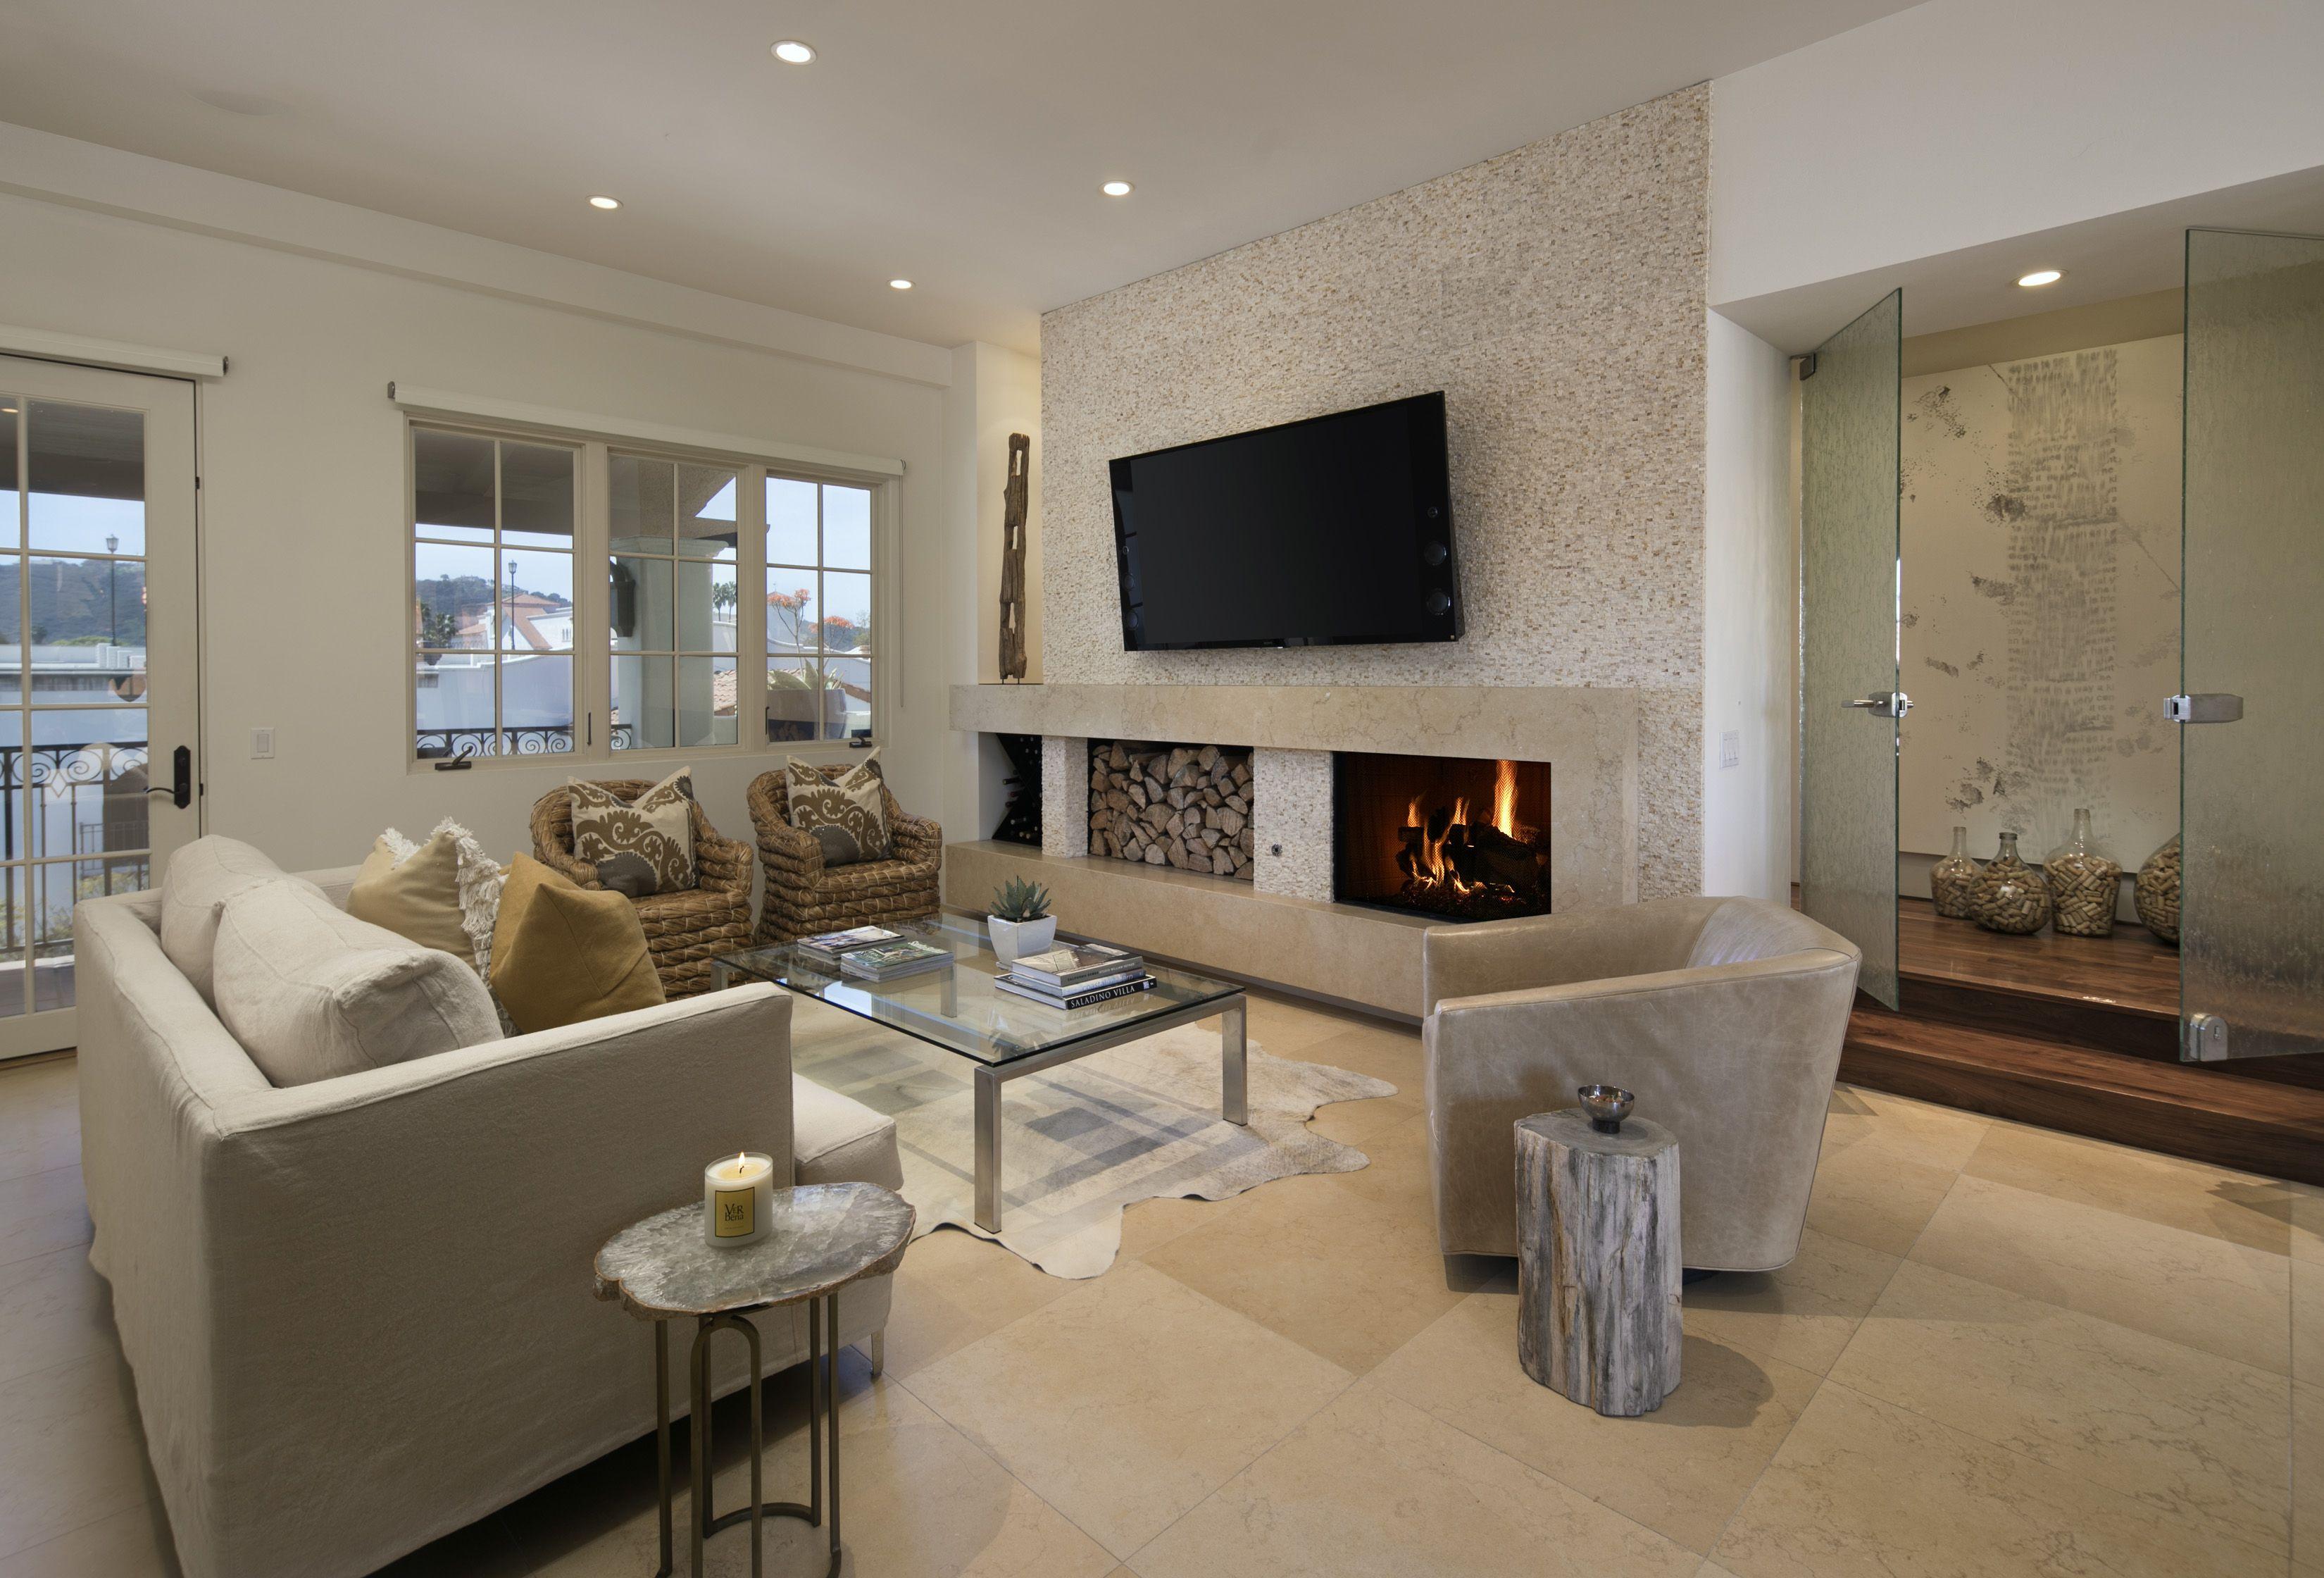 Andrea cambern designer jerusalem mini stacked stone fireplace